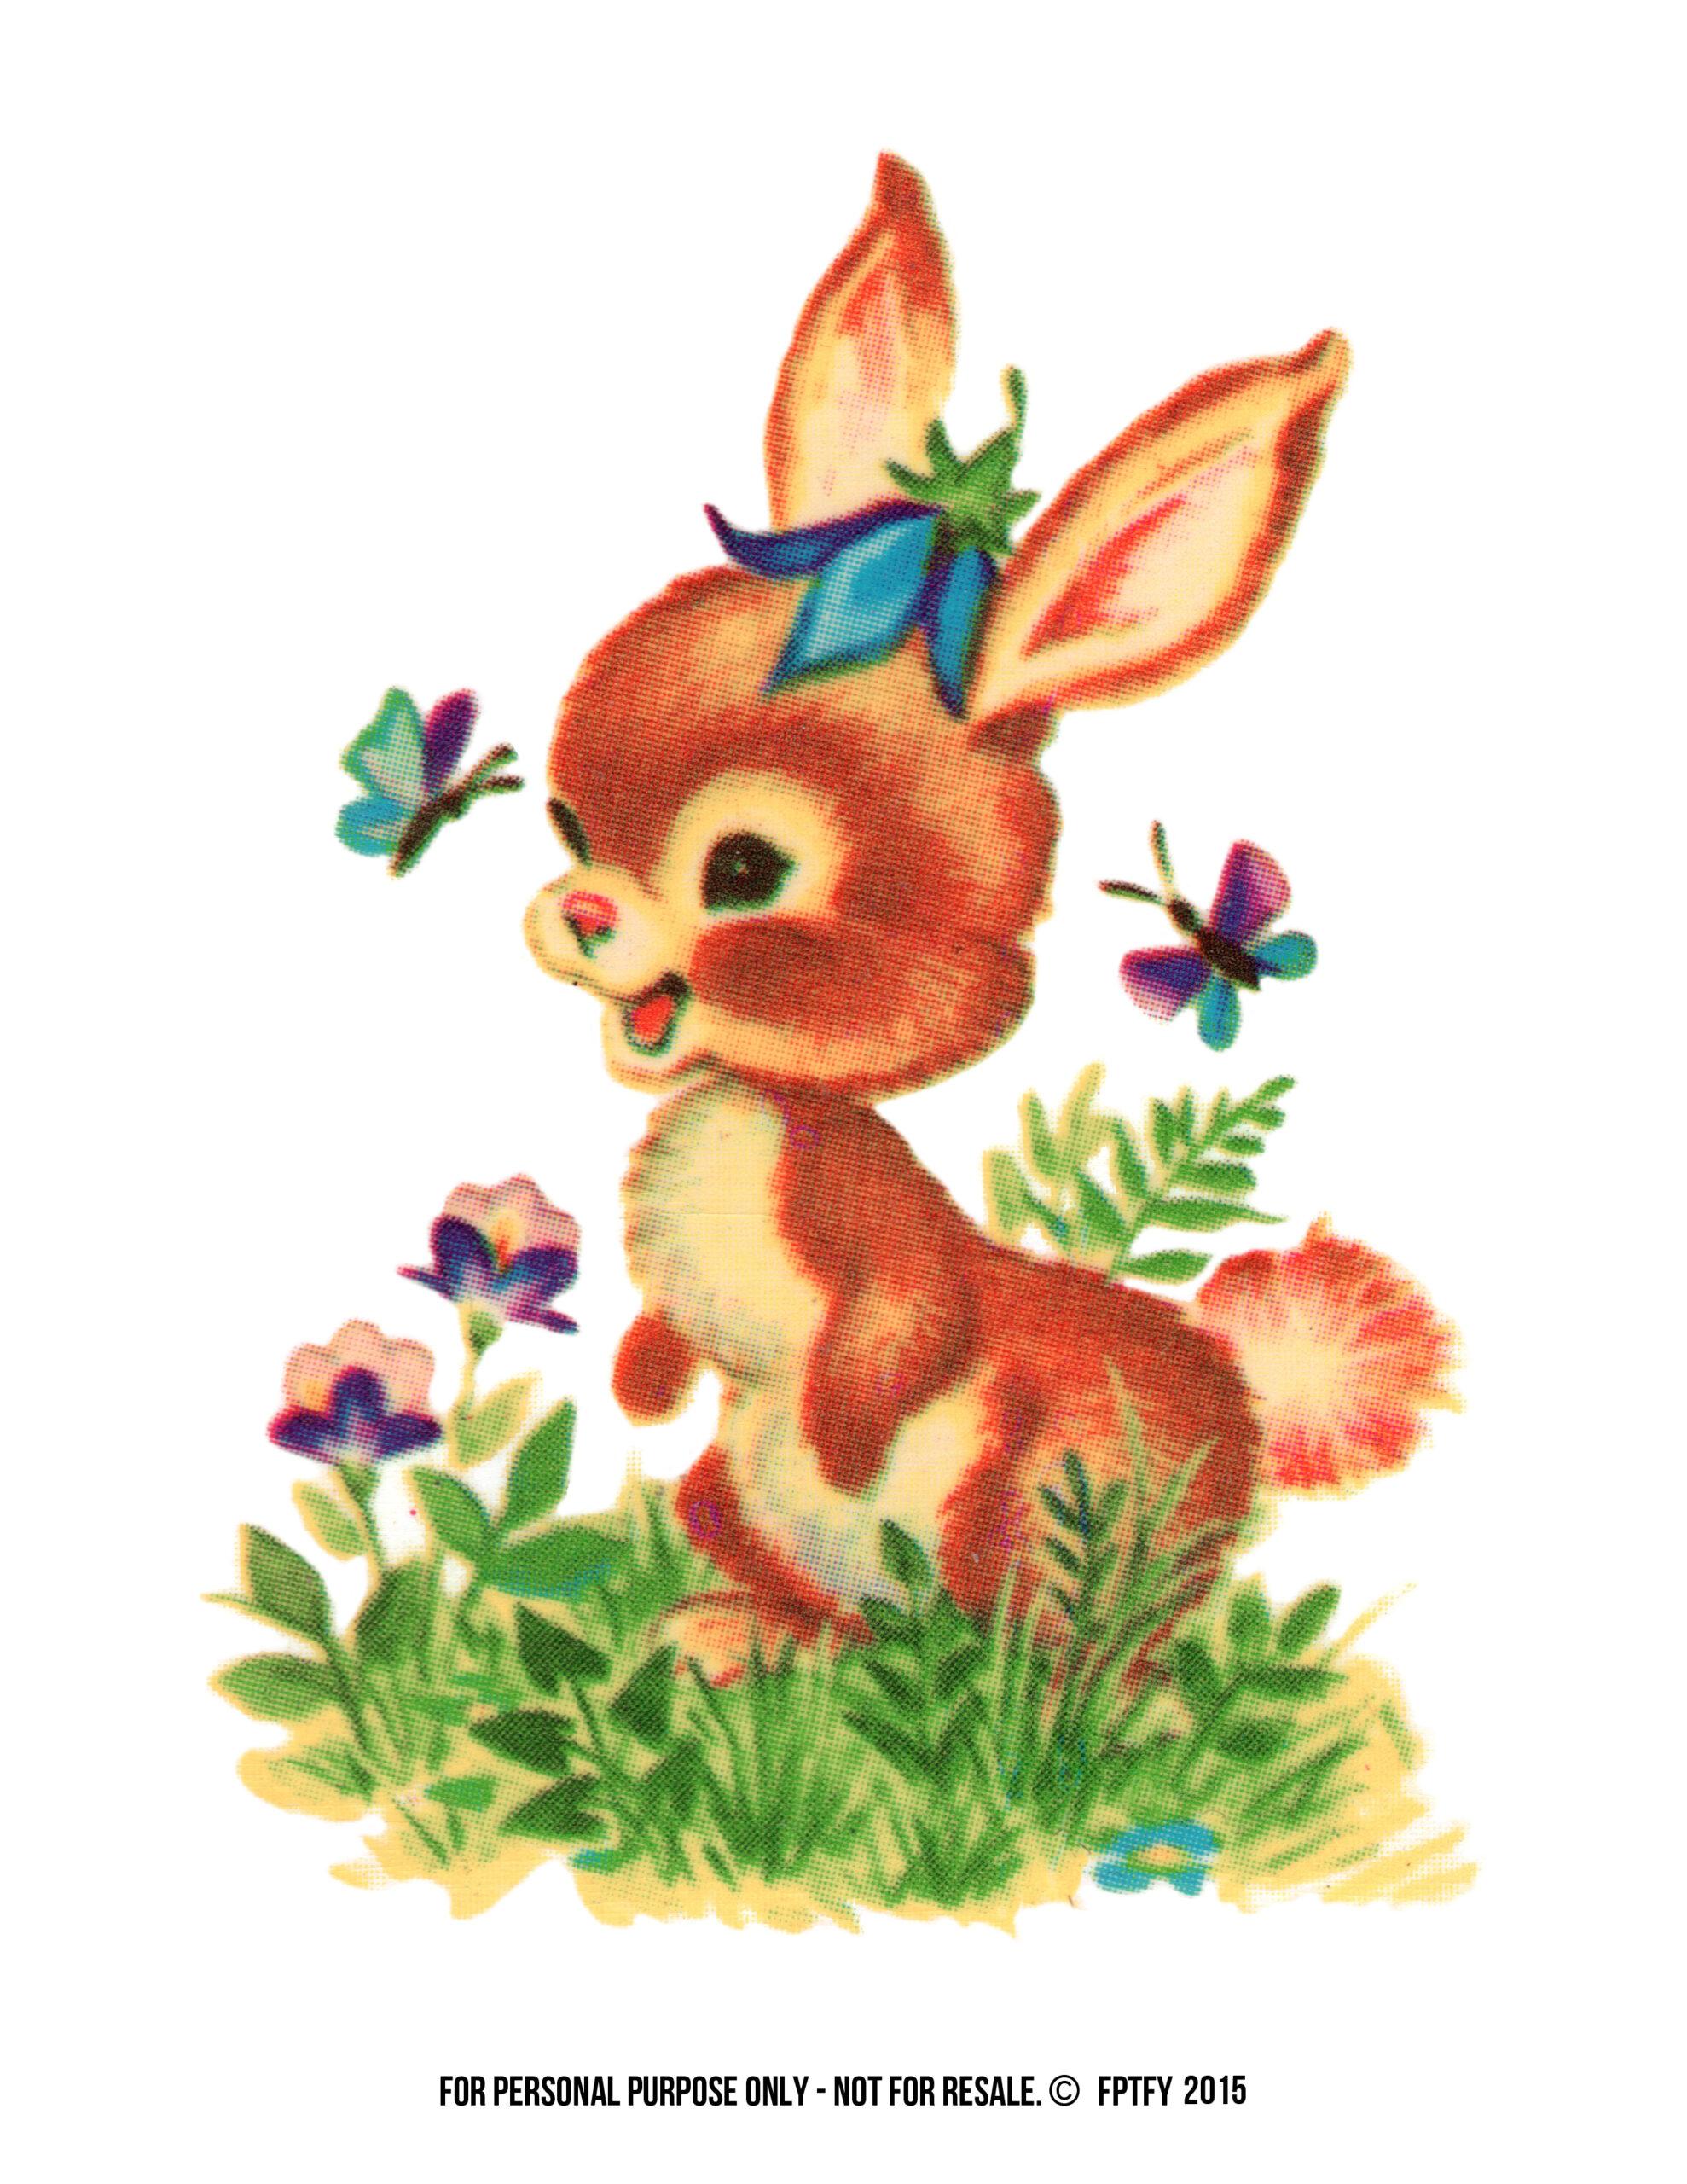 free stock photos crazy adorable vintage bunny image free